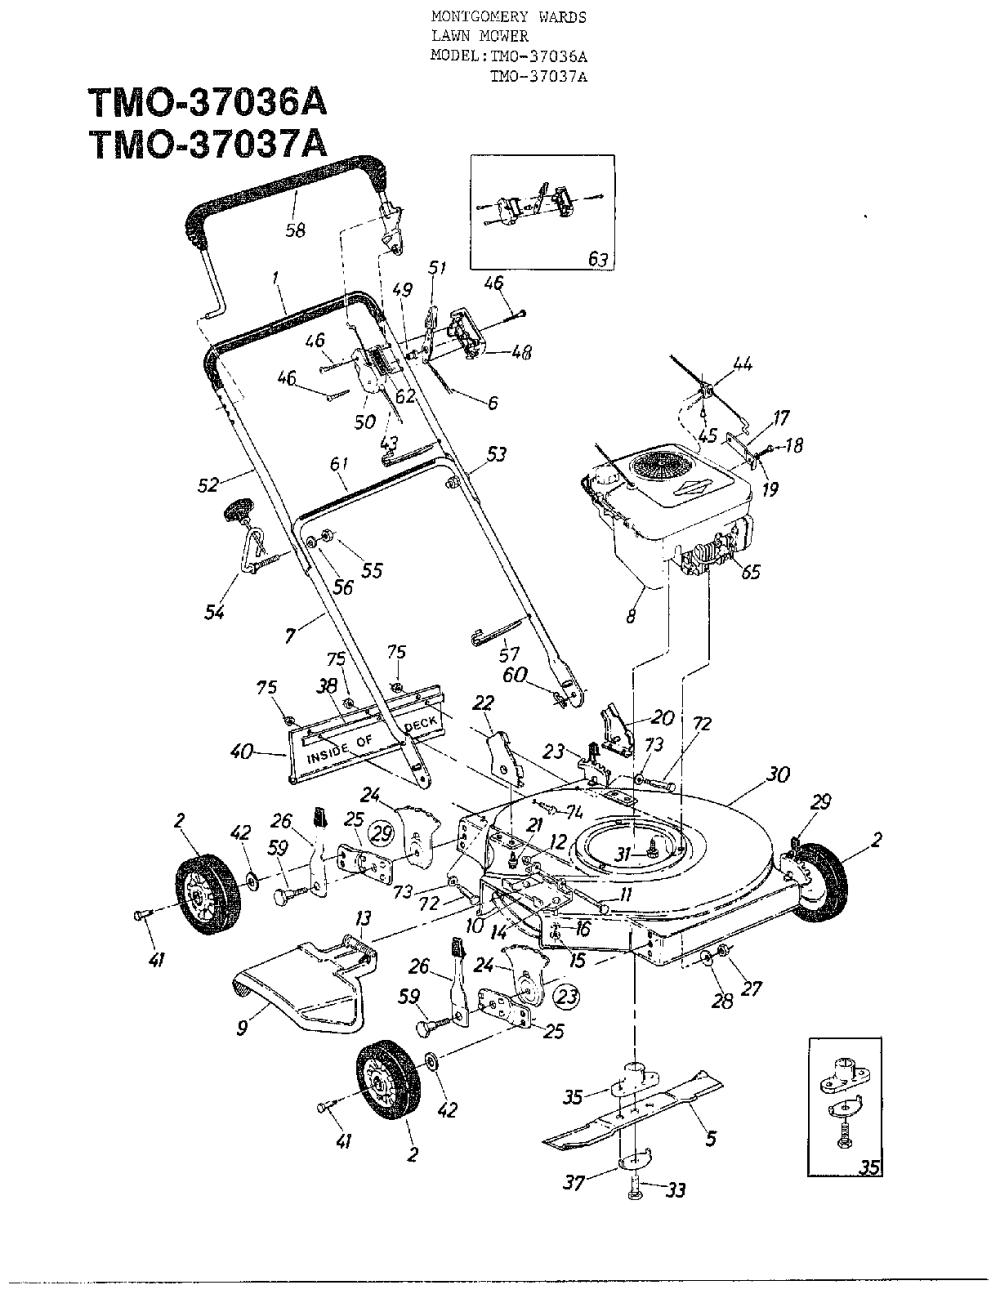 medium resolution of yardman riding mower parts diagram wiring diagram